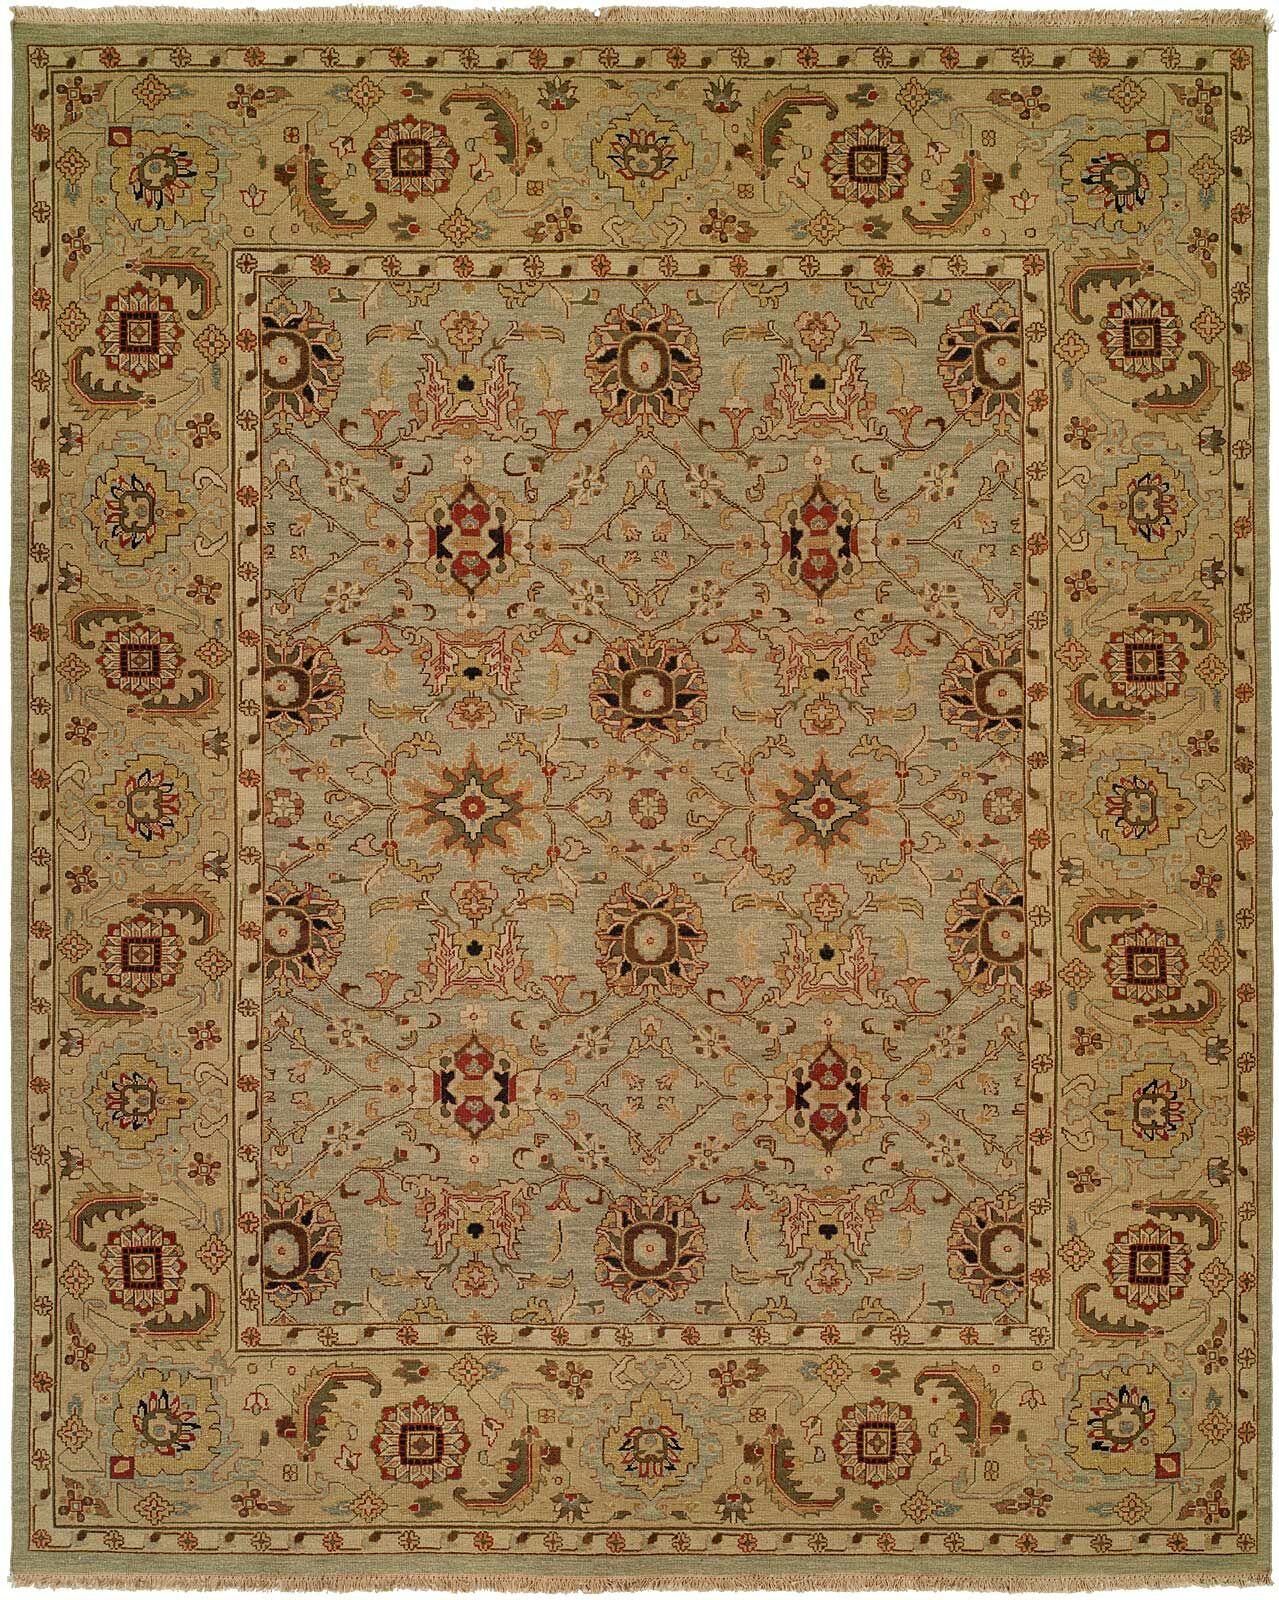 Mazatlan Hand-Woven Brown Area Rug Rug Size: Rectangle 4' x 10'